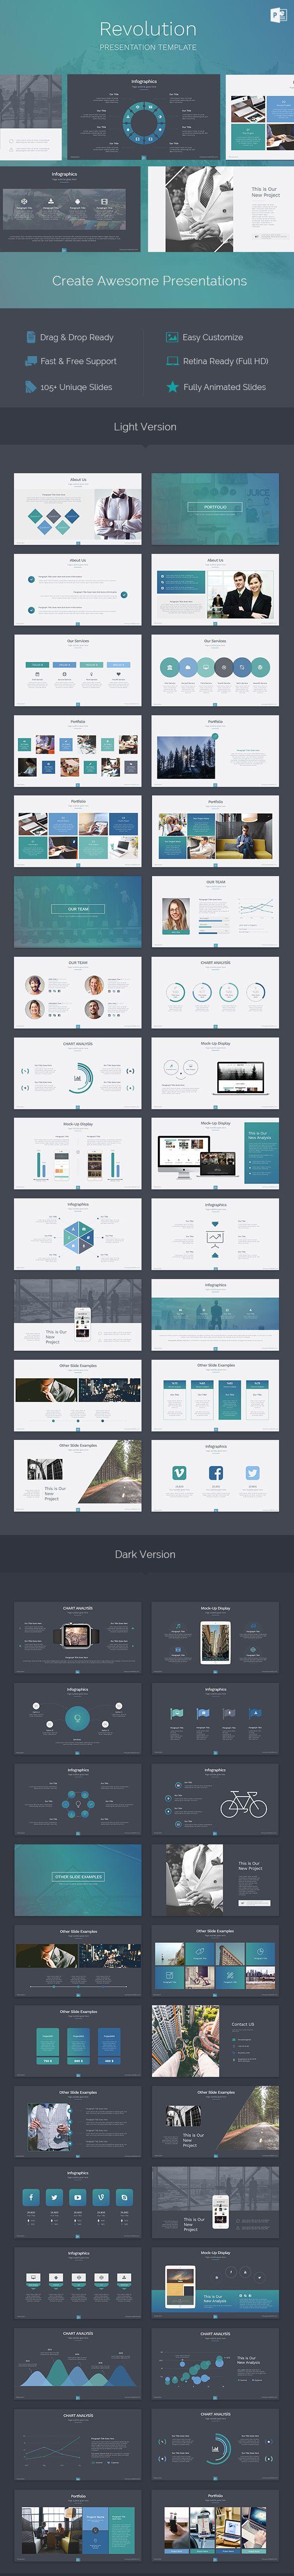 Revolution - Creative Powerpoint Template - PowerPoint Templates Presentation…